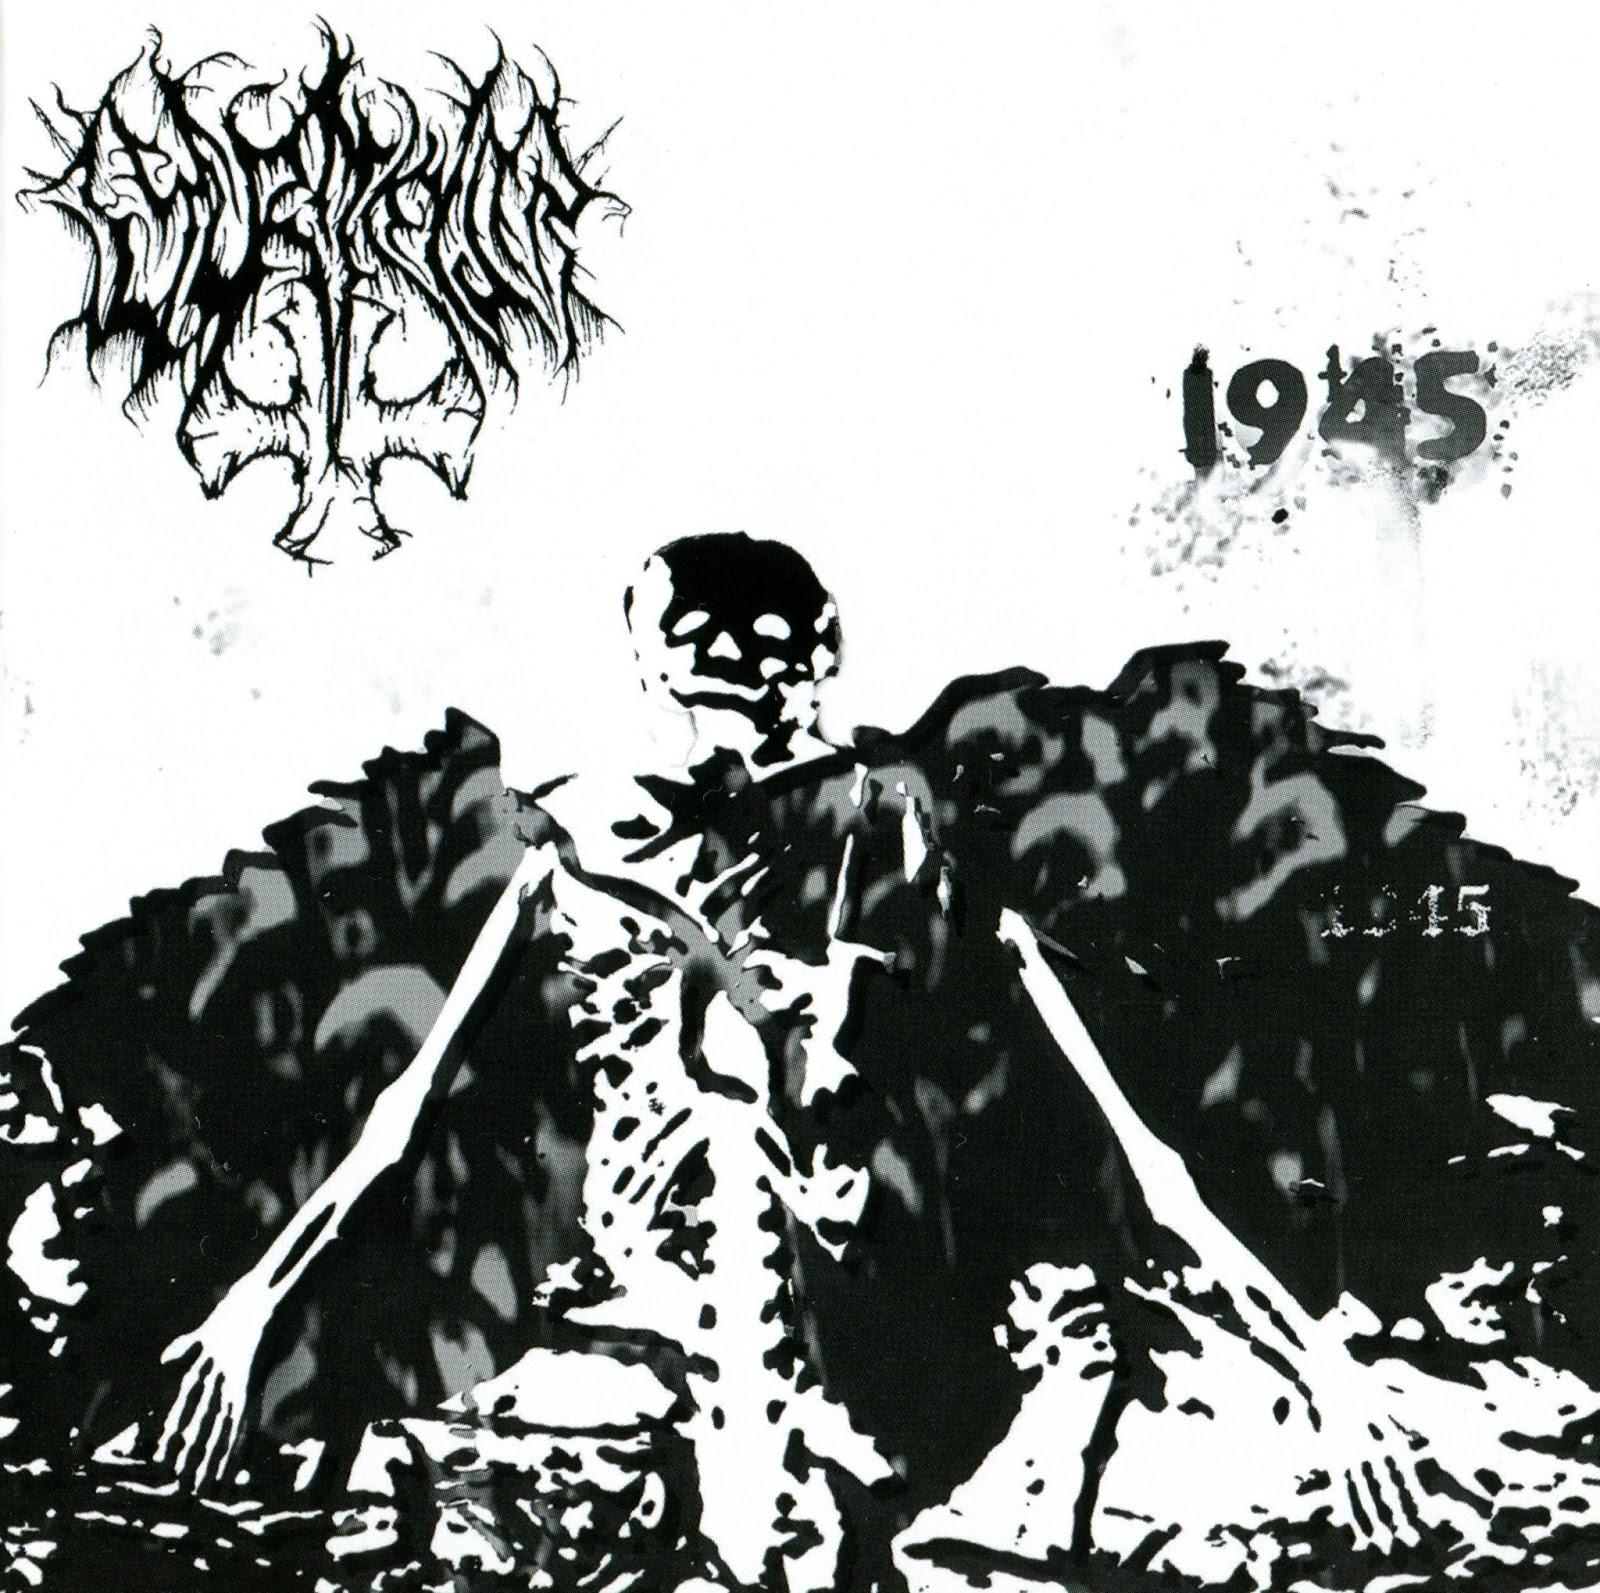 Sturmkaiser - 1945 [EP] (2005)